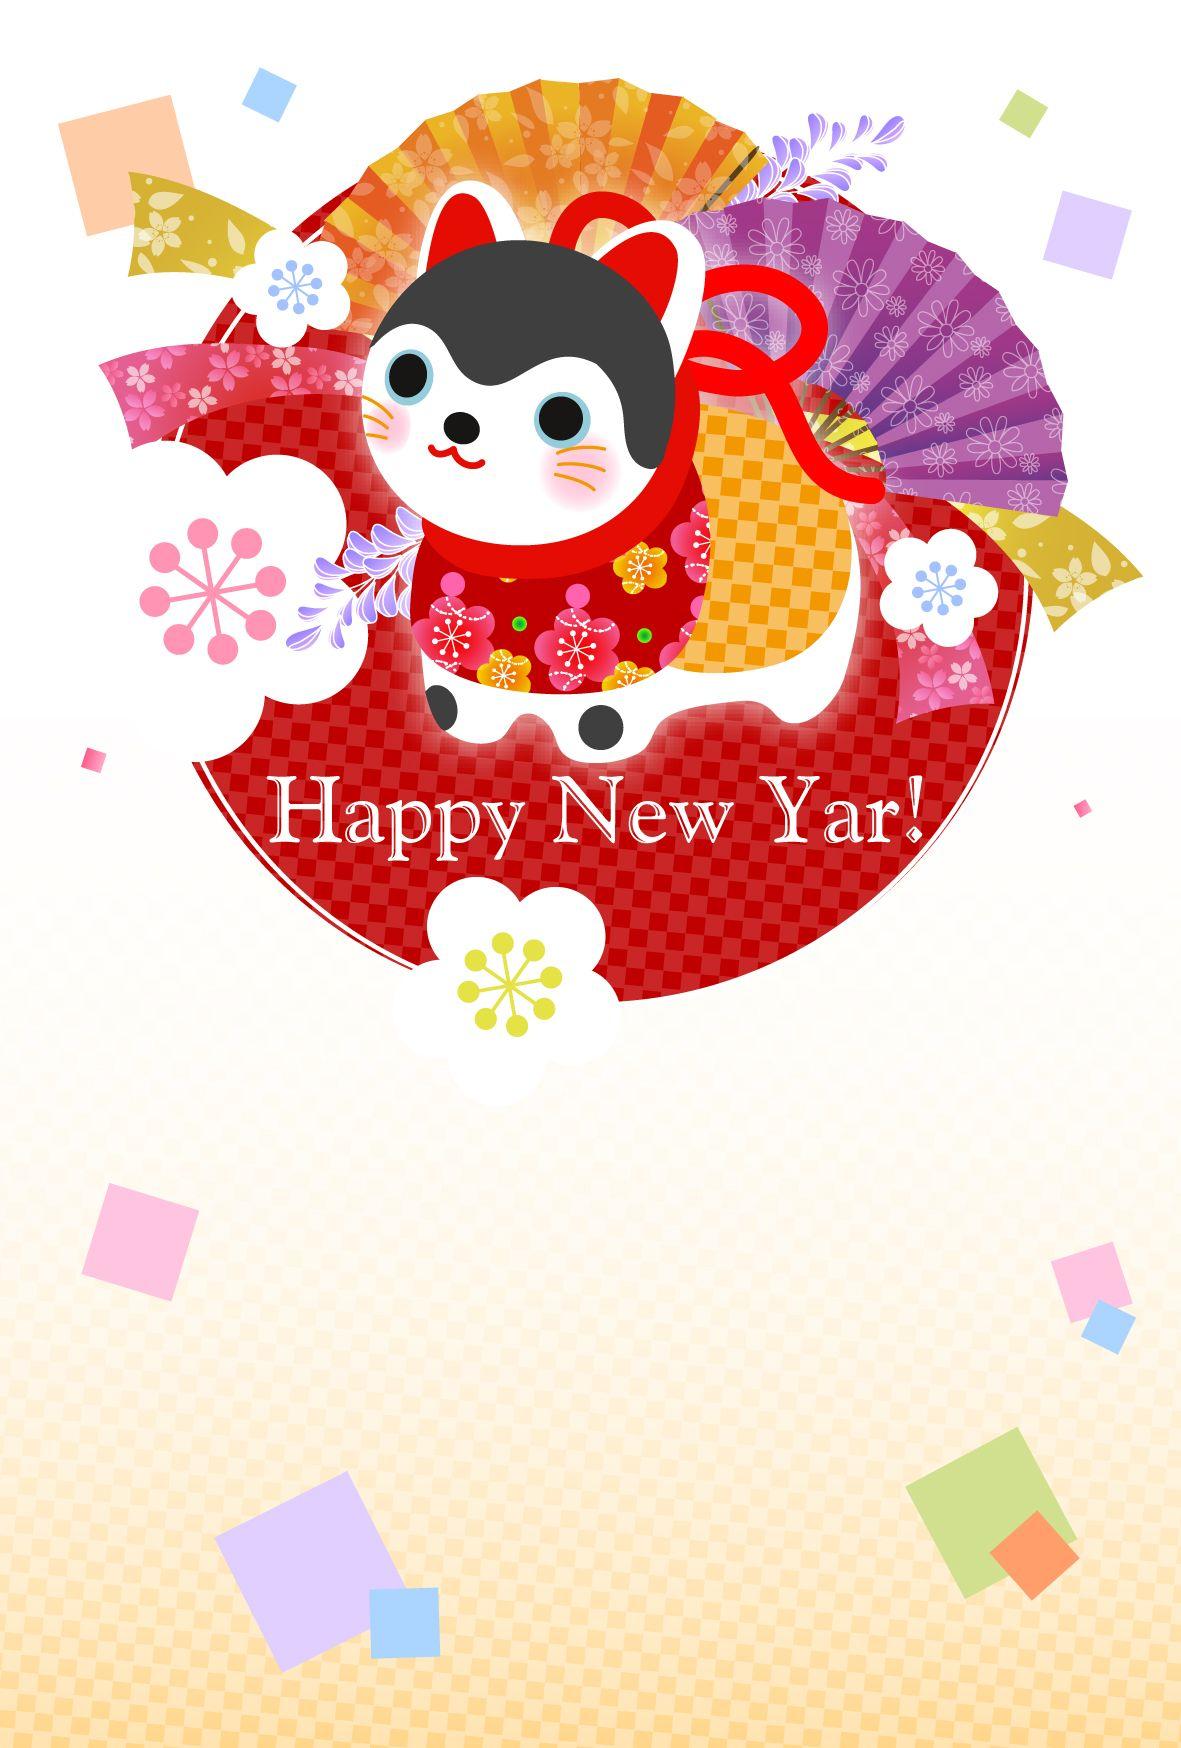 Pin de GB en New Year | Pinterest | Colorear